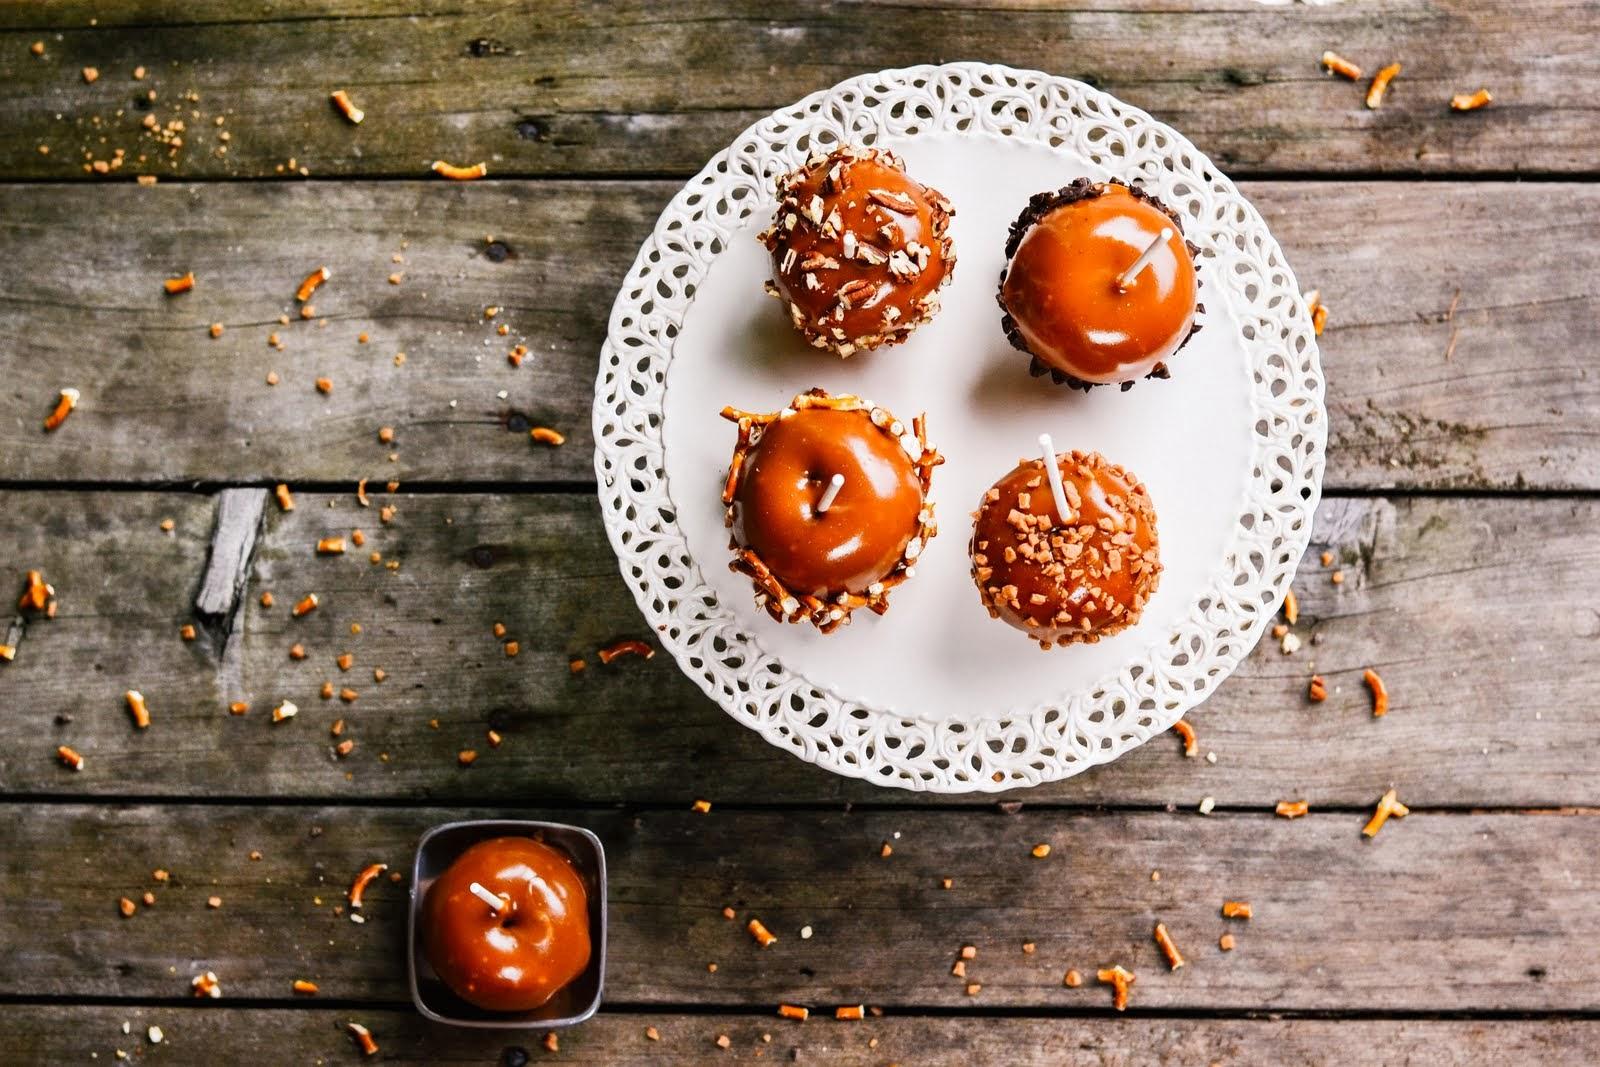 caramel+apples-1-24.jpg